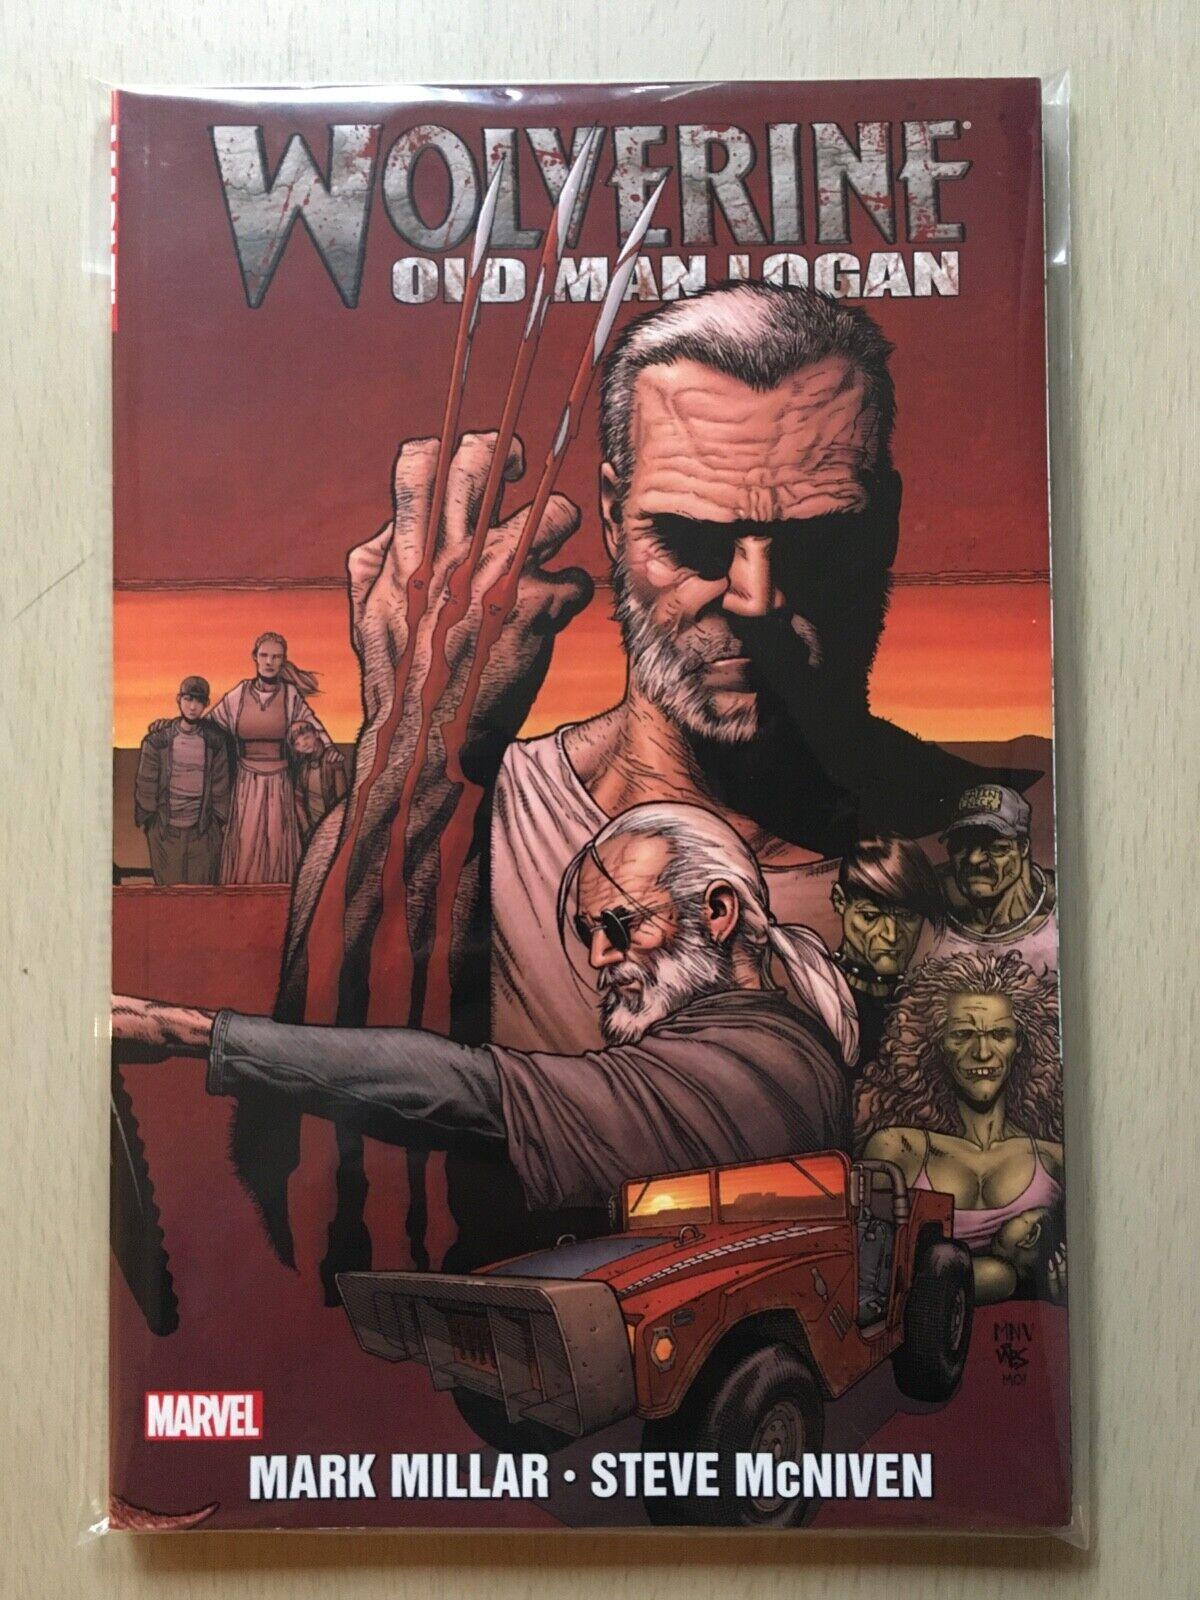 Wolverine Old Man Logan TPB Marvel Mark Millar Steve McNiven - $20.00